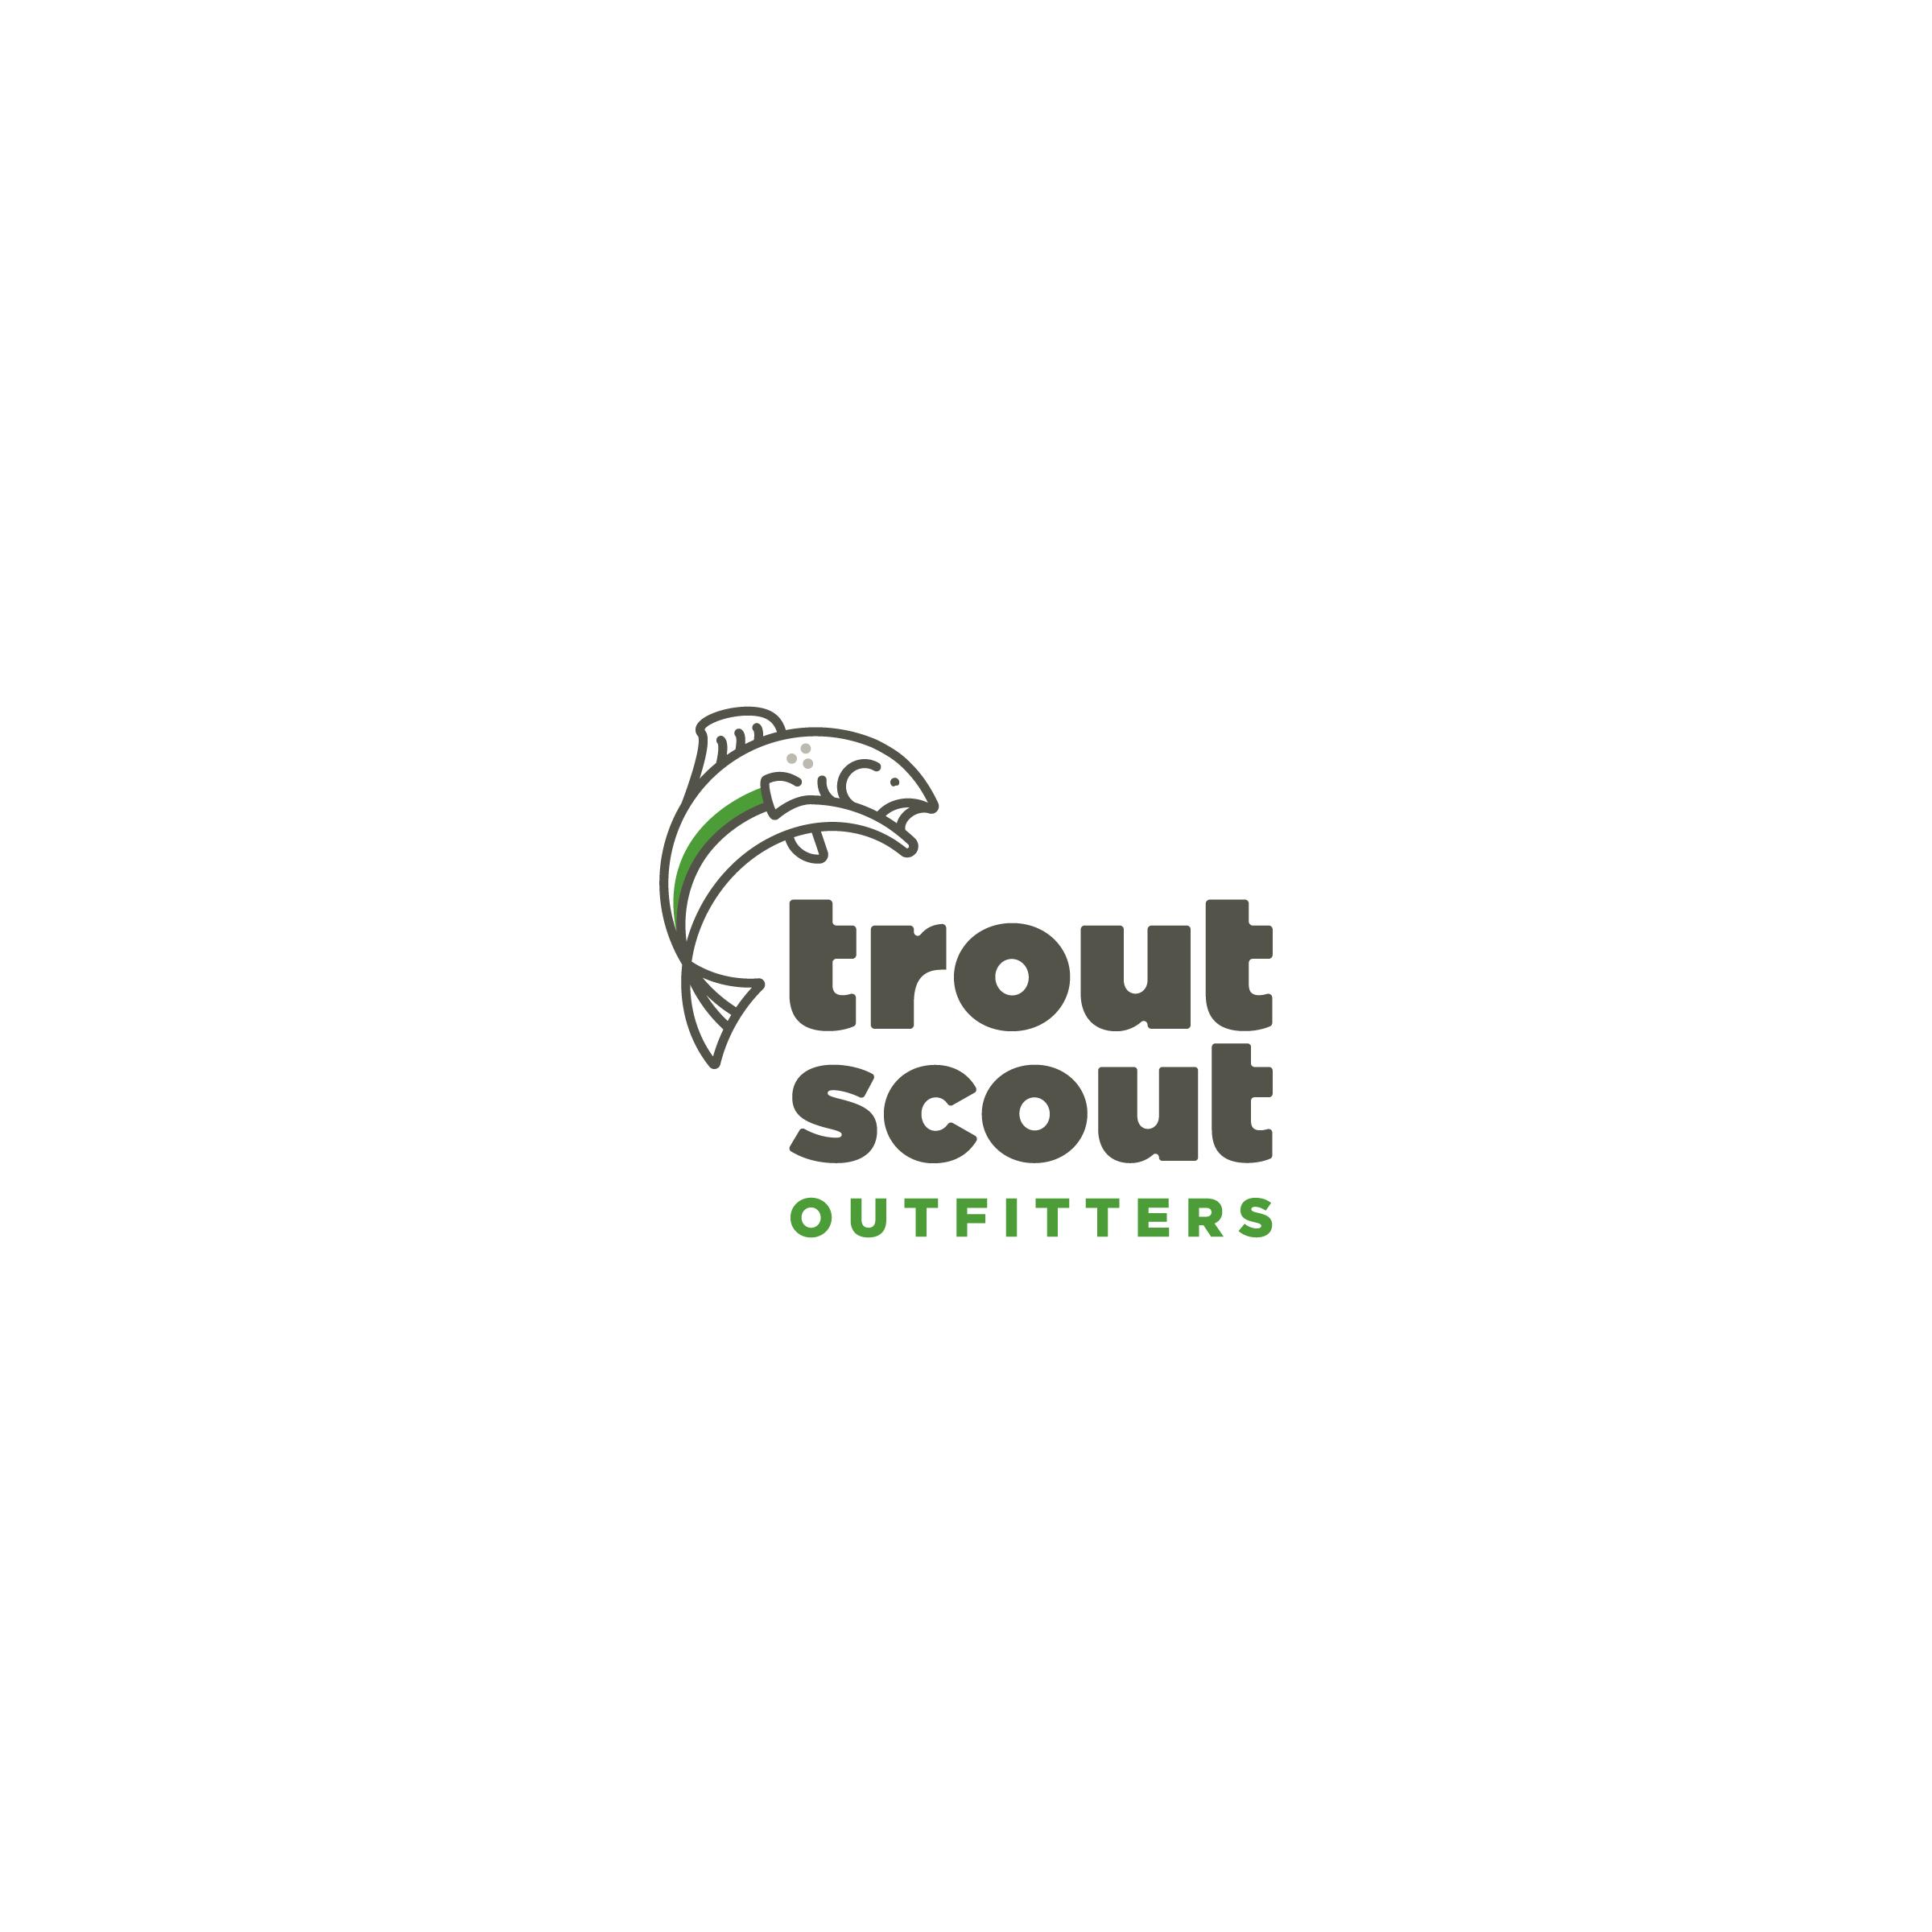 TroutScoutOutfitters_Cuttie_3Clr_Vert.jpg